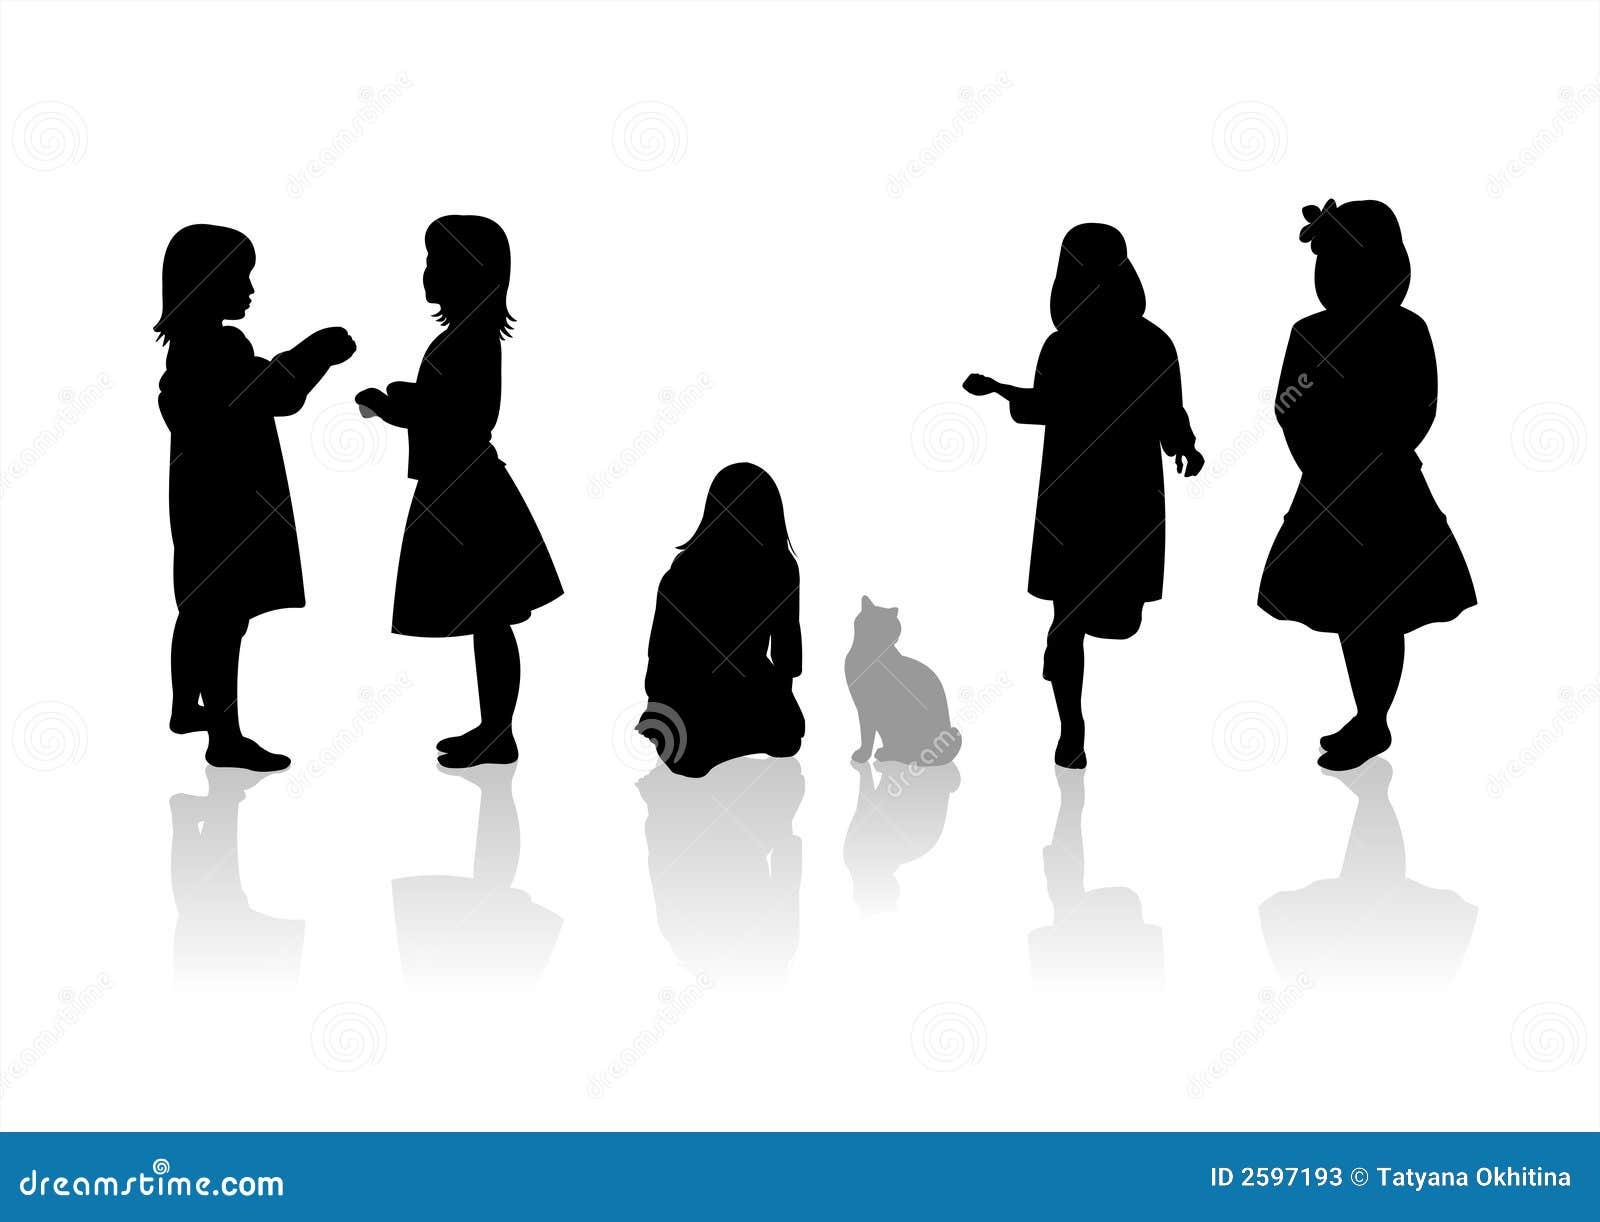 Children silhouettes 9